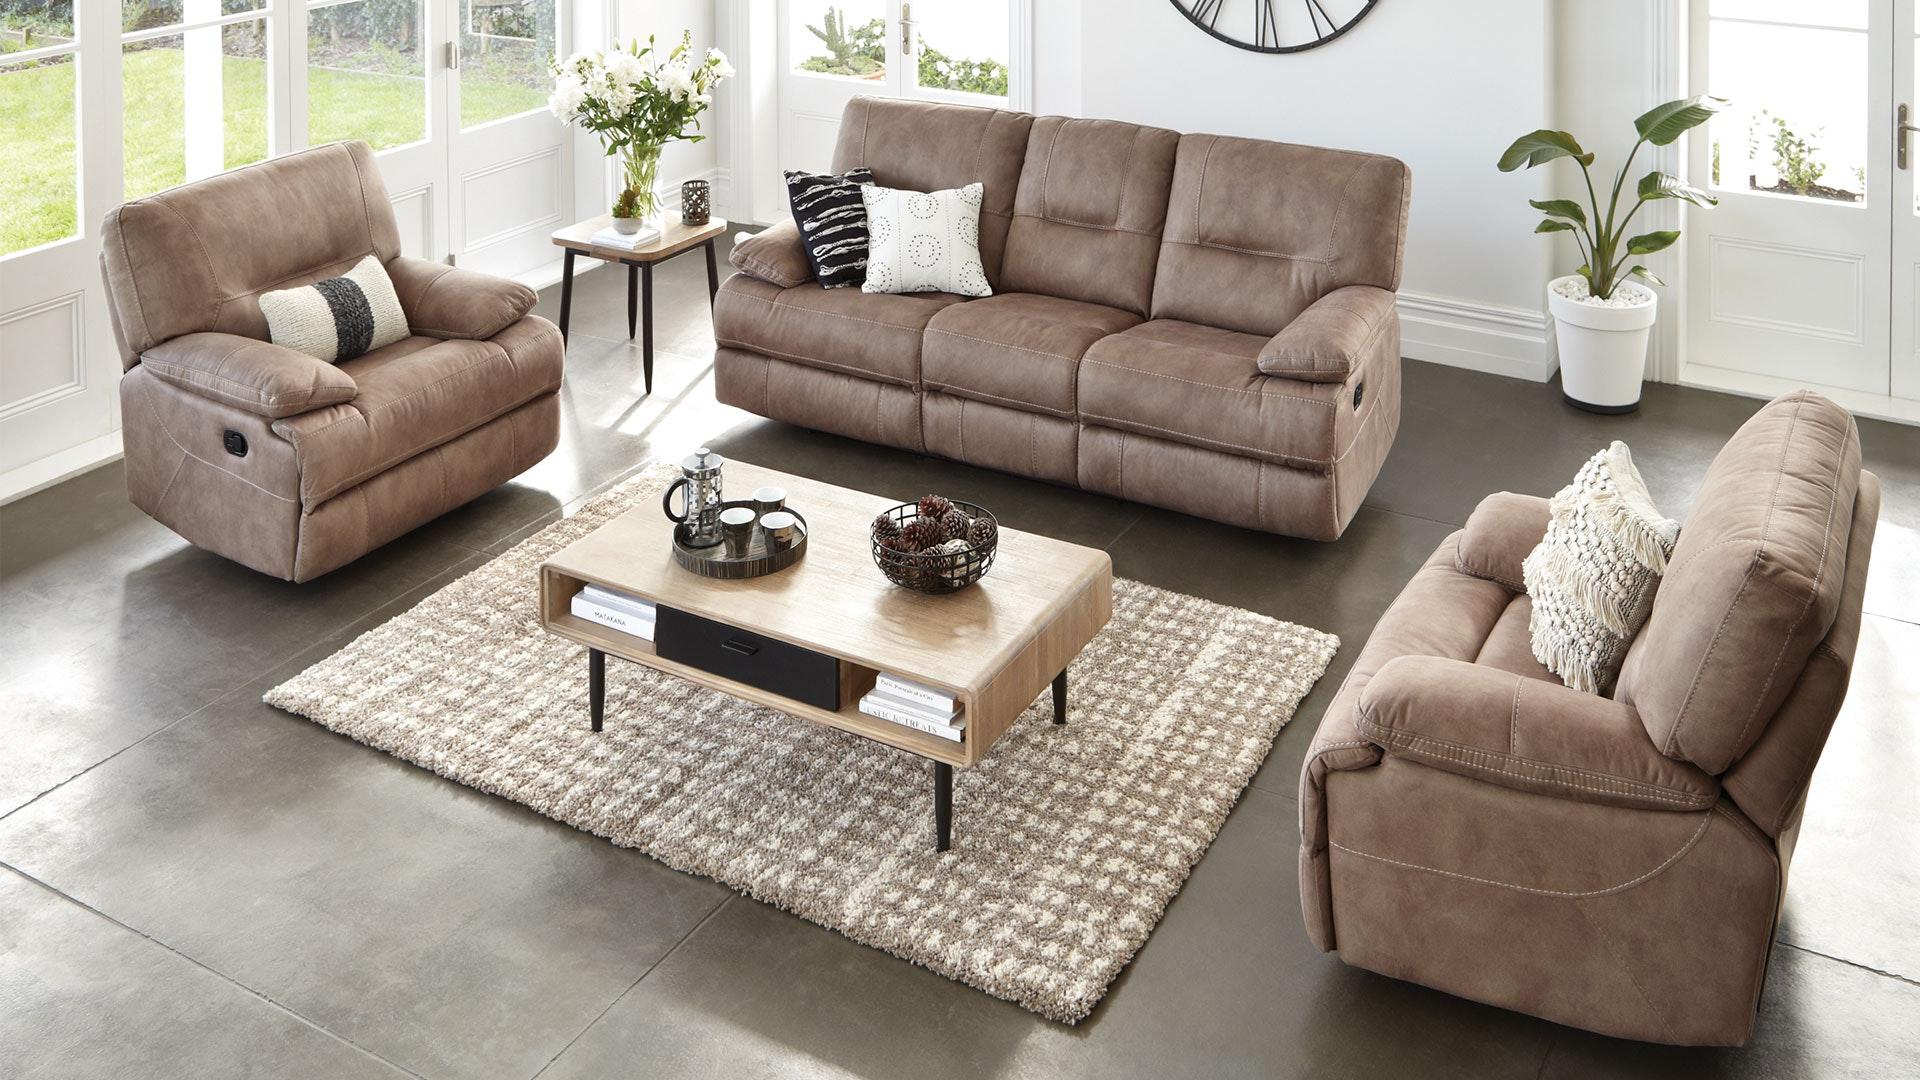 Dorset 3 Piece Fabric Recliner Lounge Suite